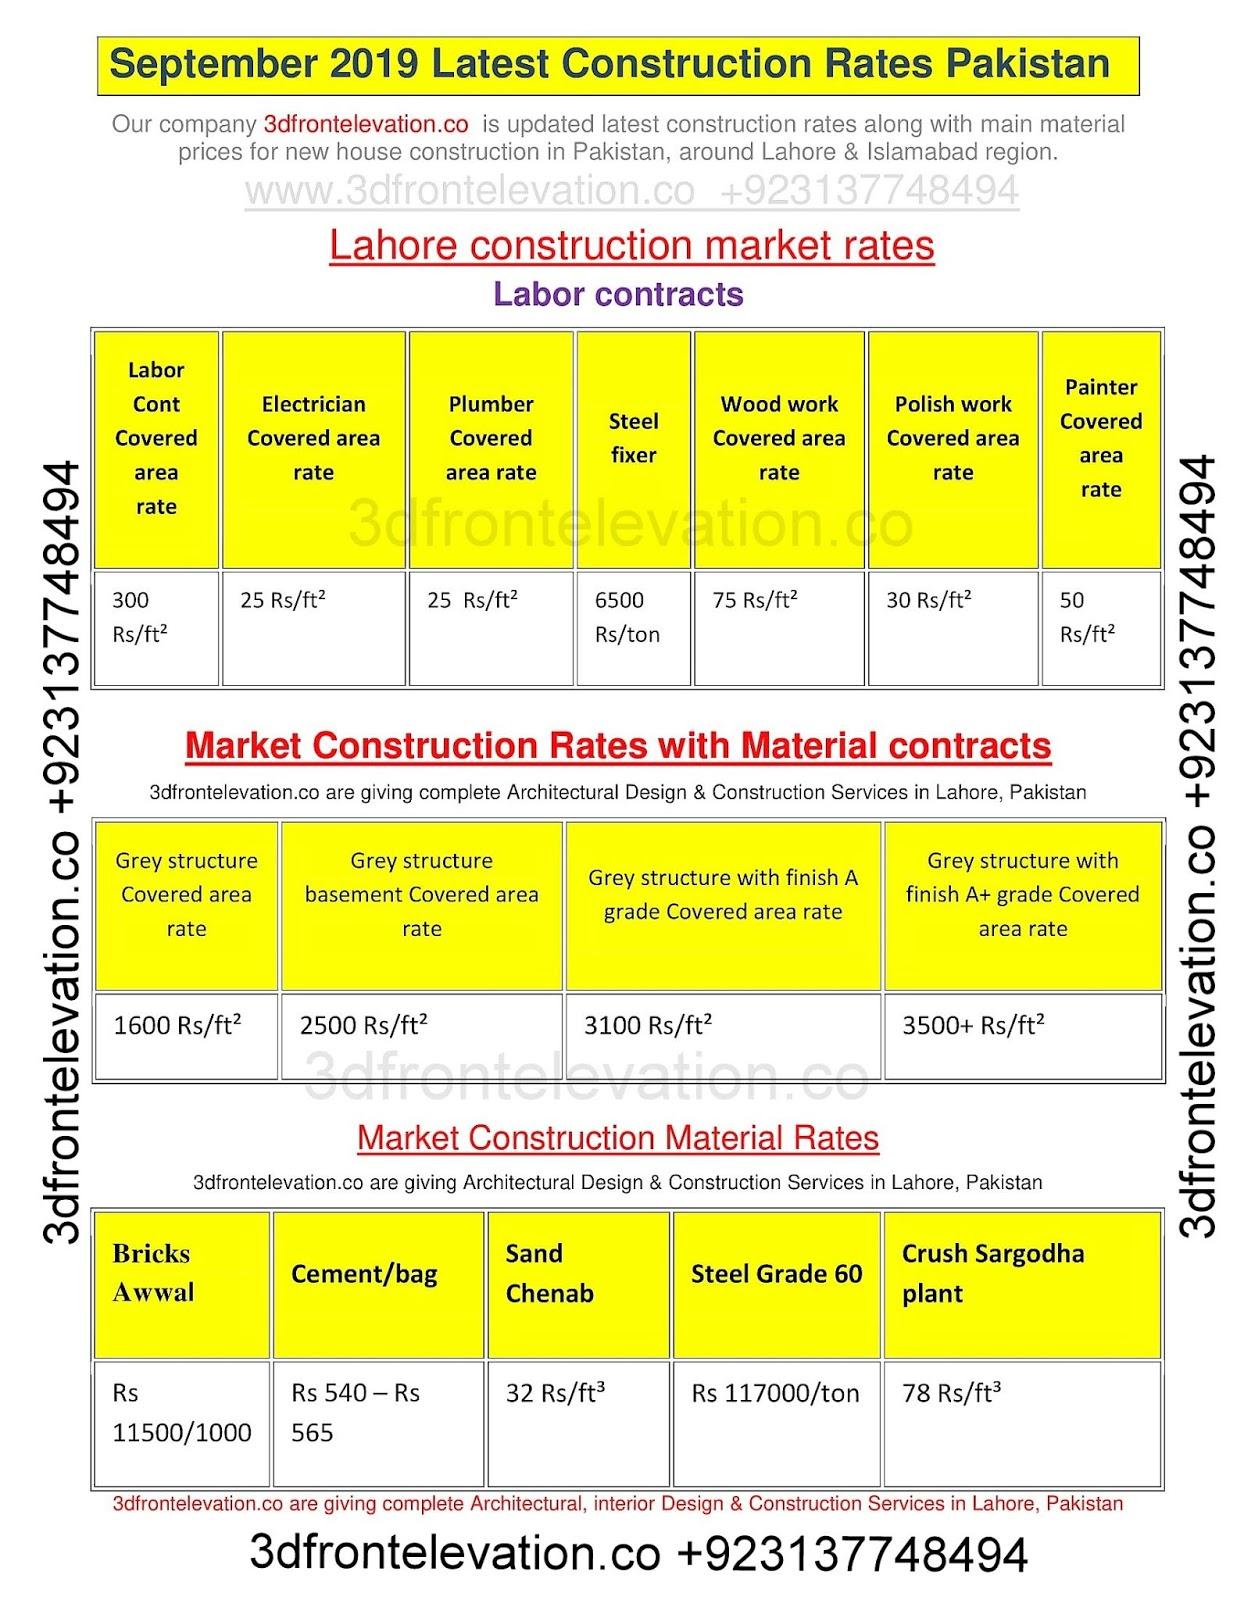 September 2019 Latest Construction Rates Pakistan